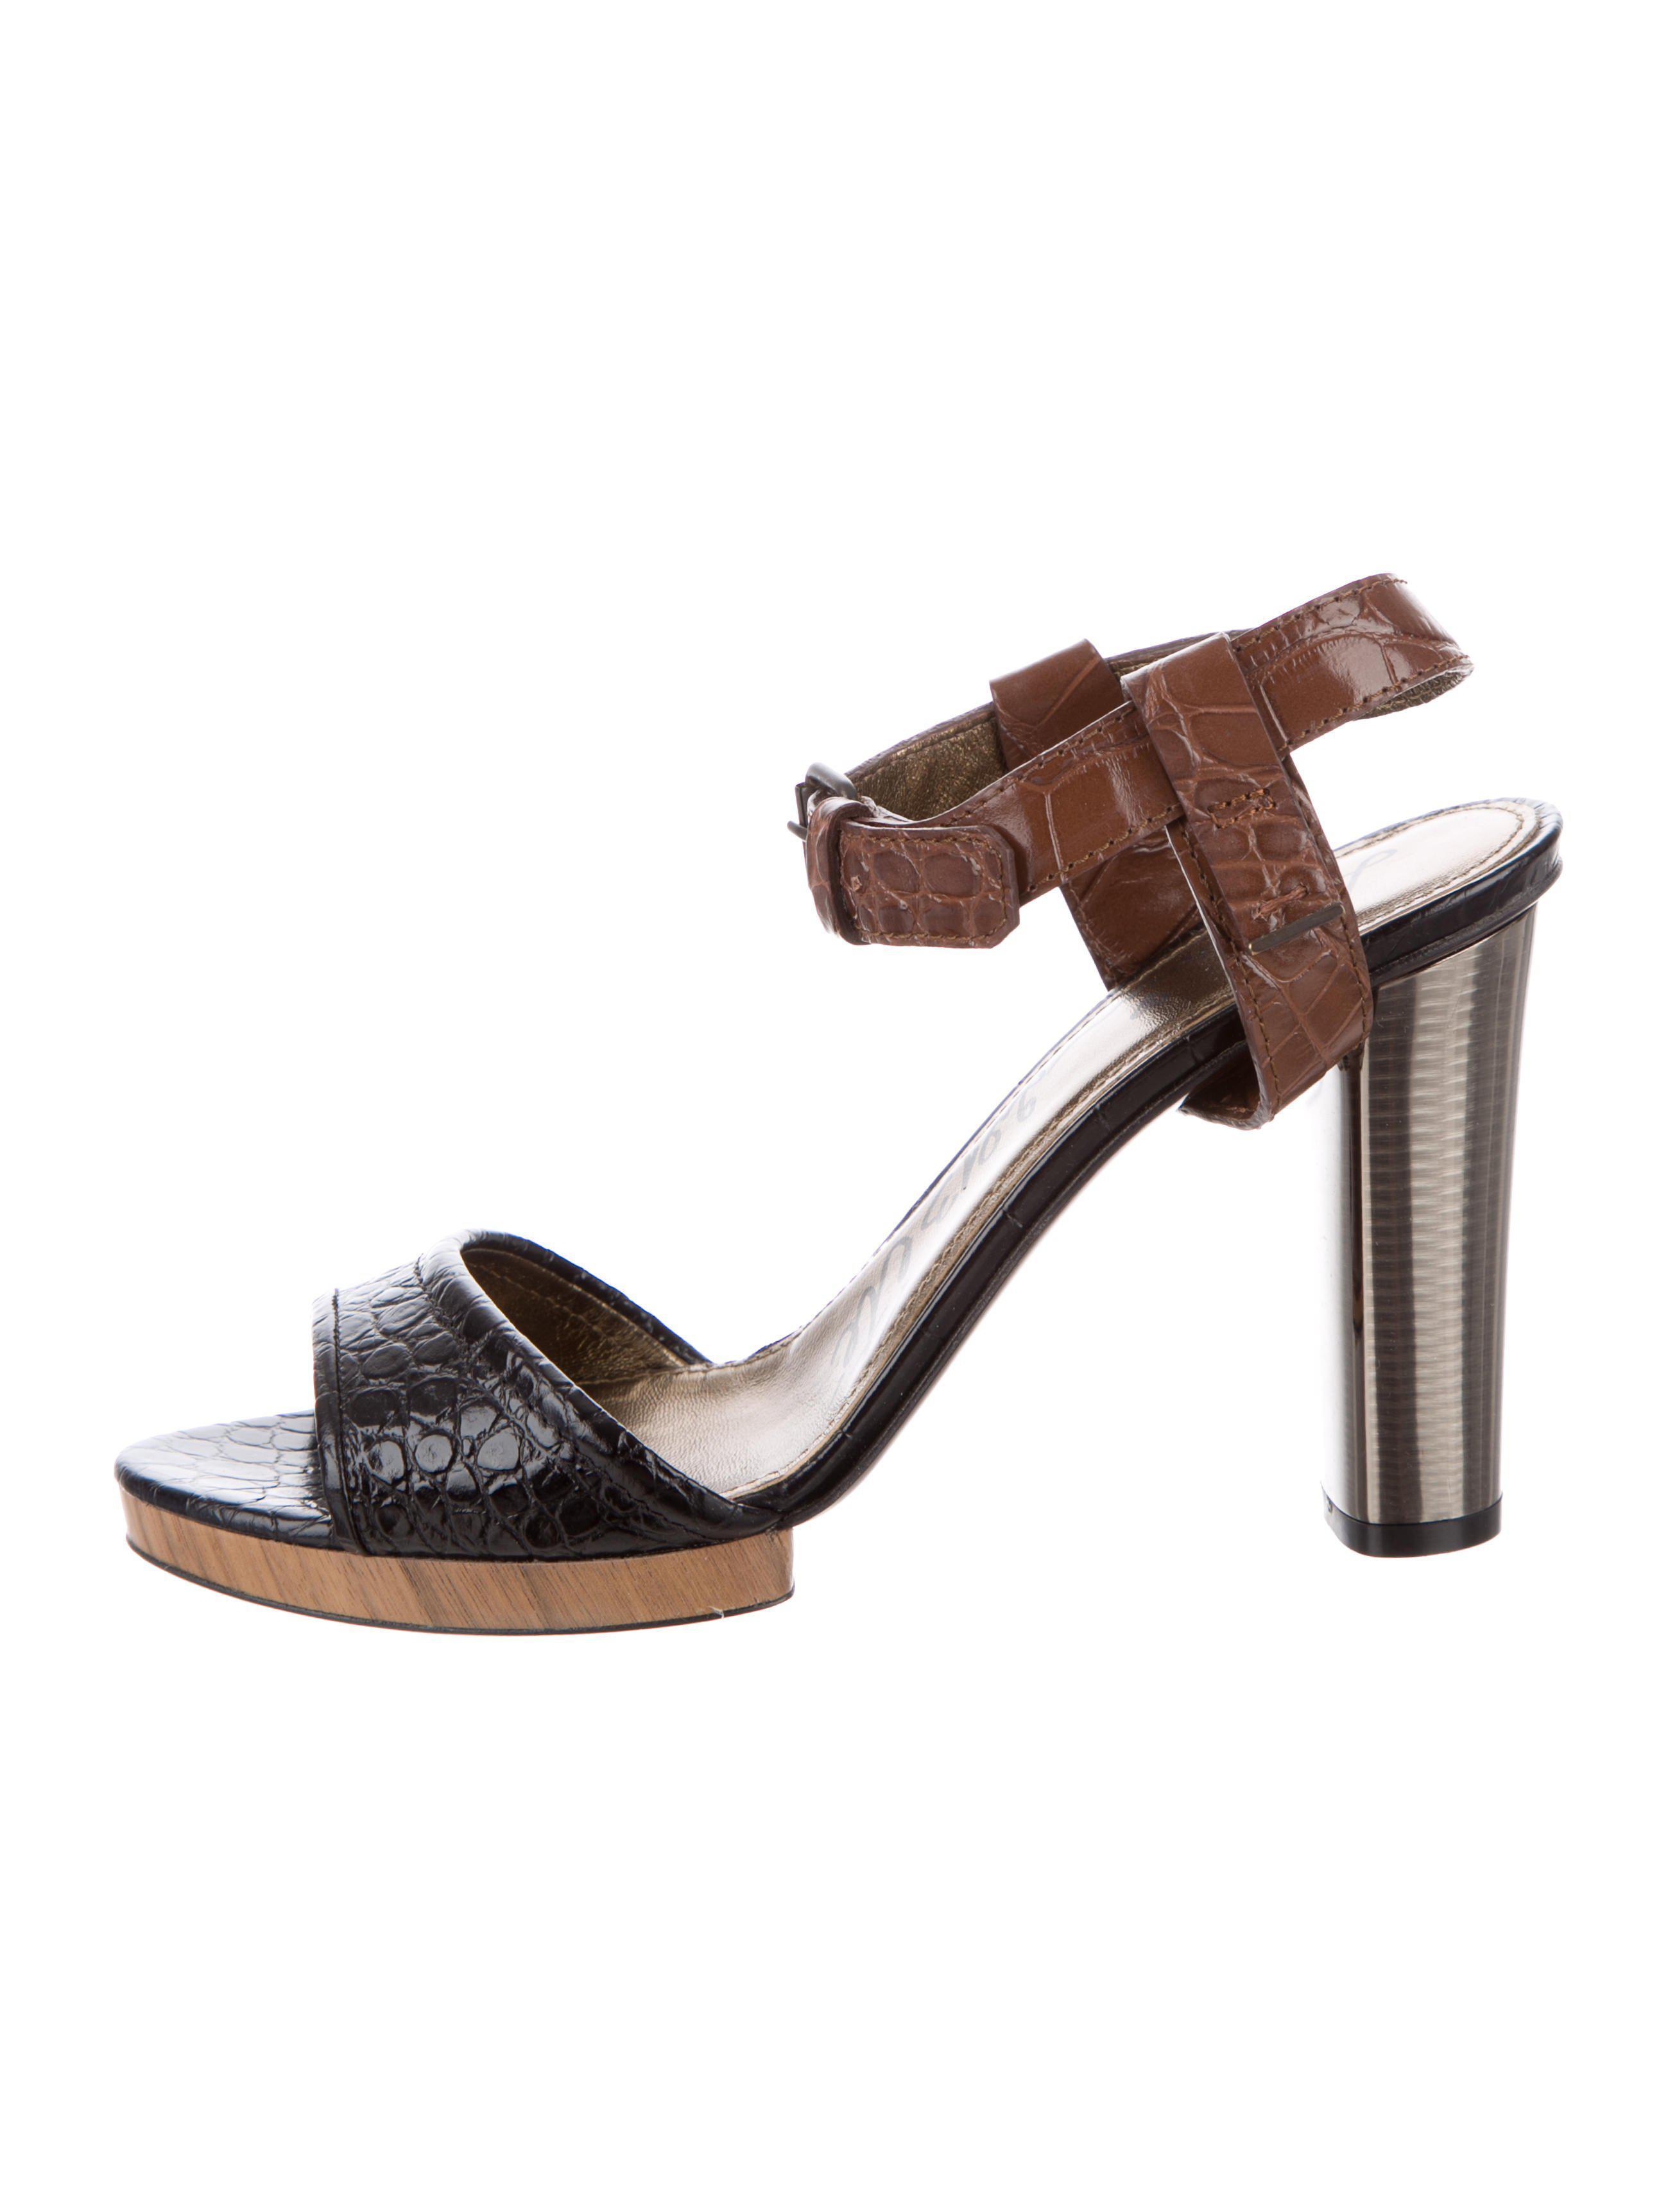 Lanvin Embossed T-Strap Sandals buy cheap huge surprise j7DxNma